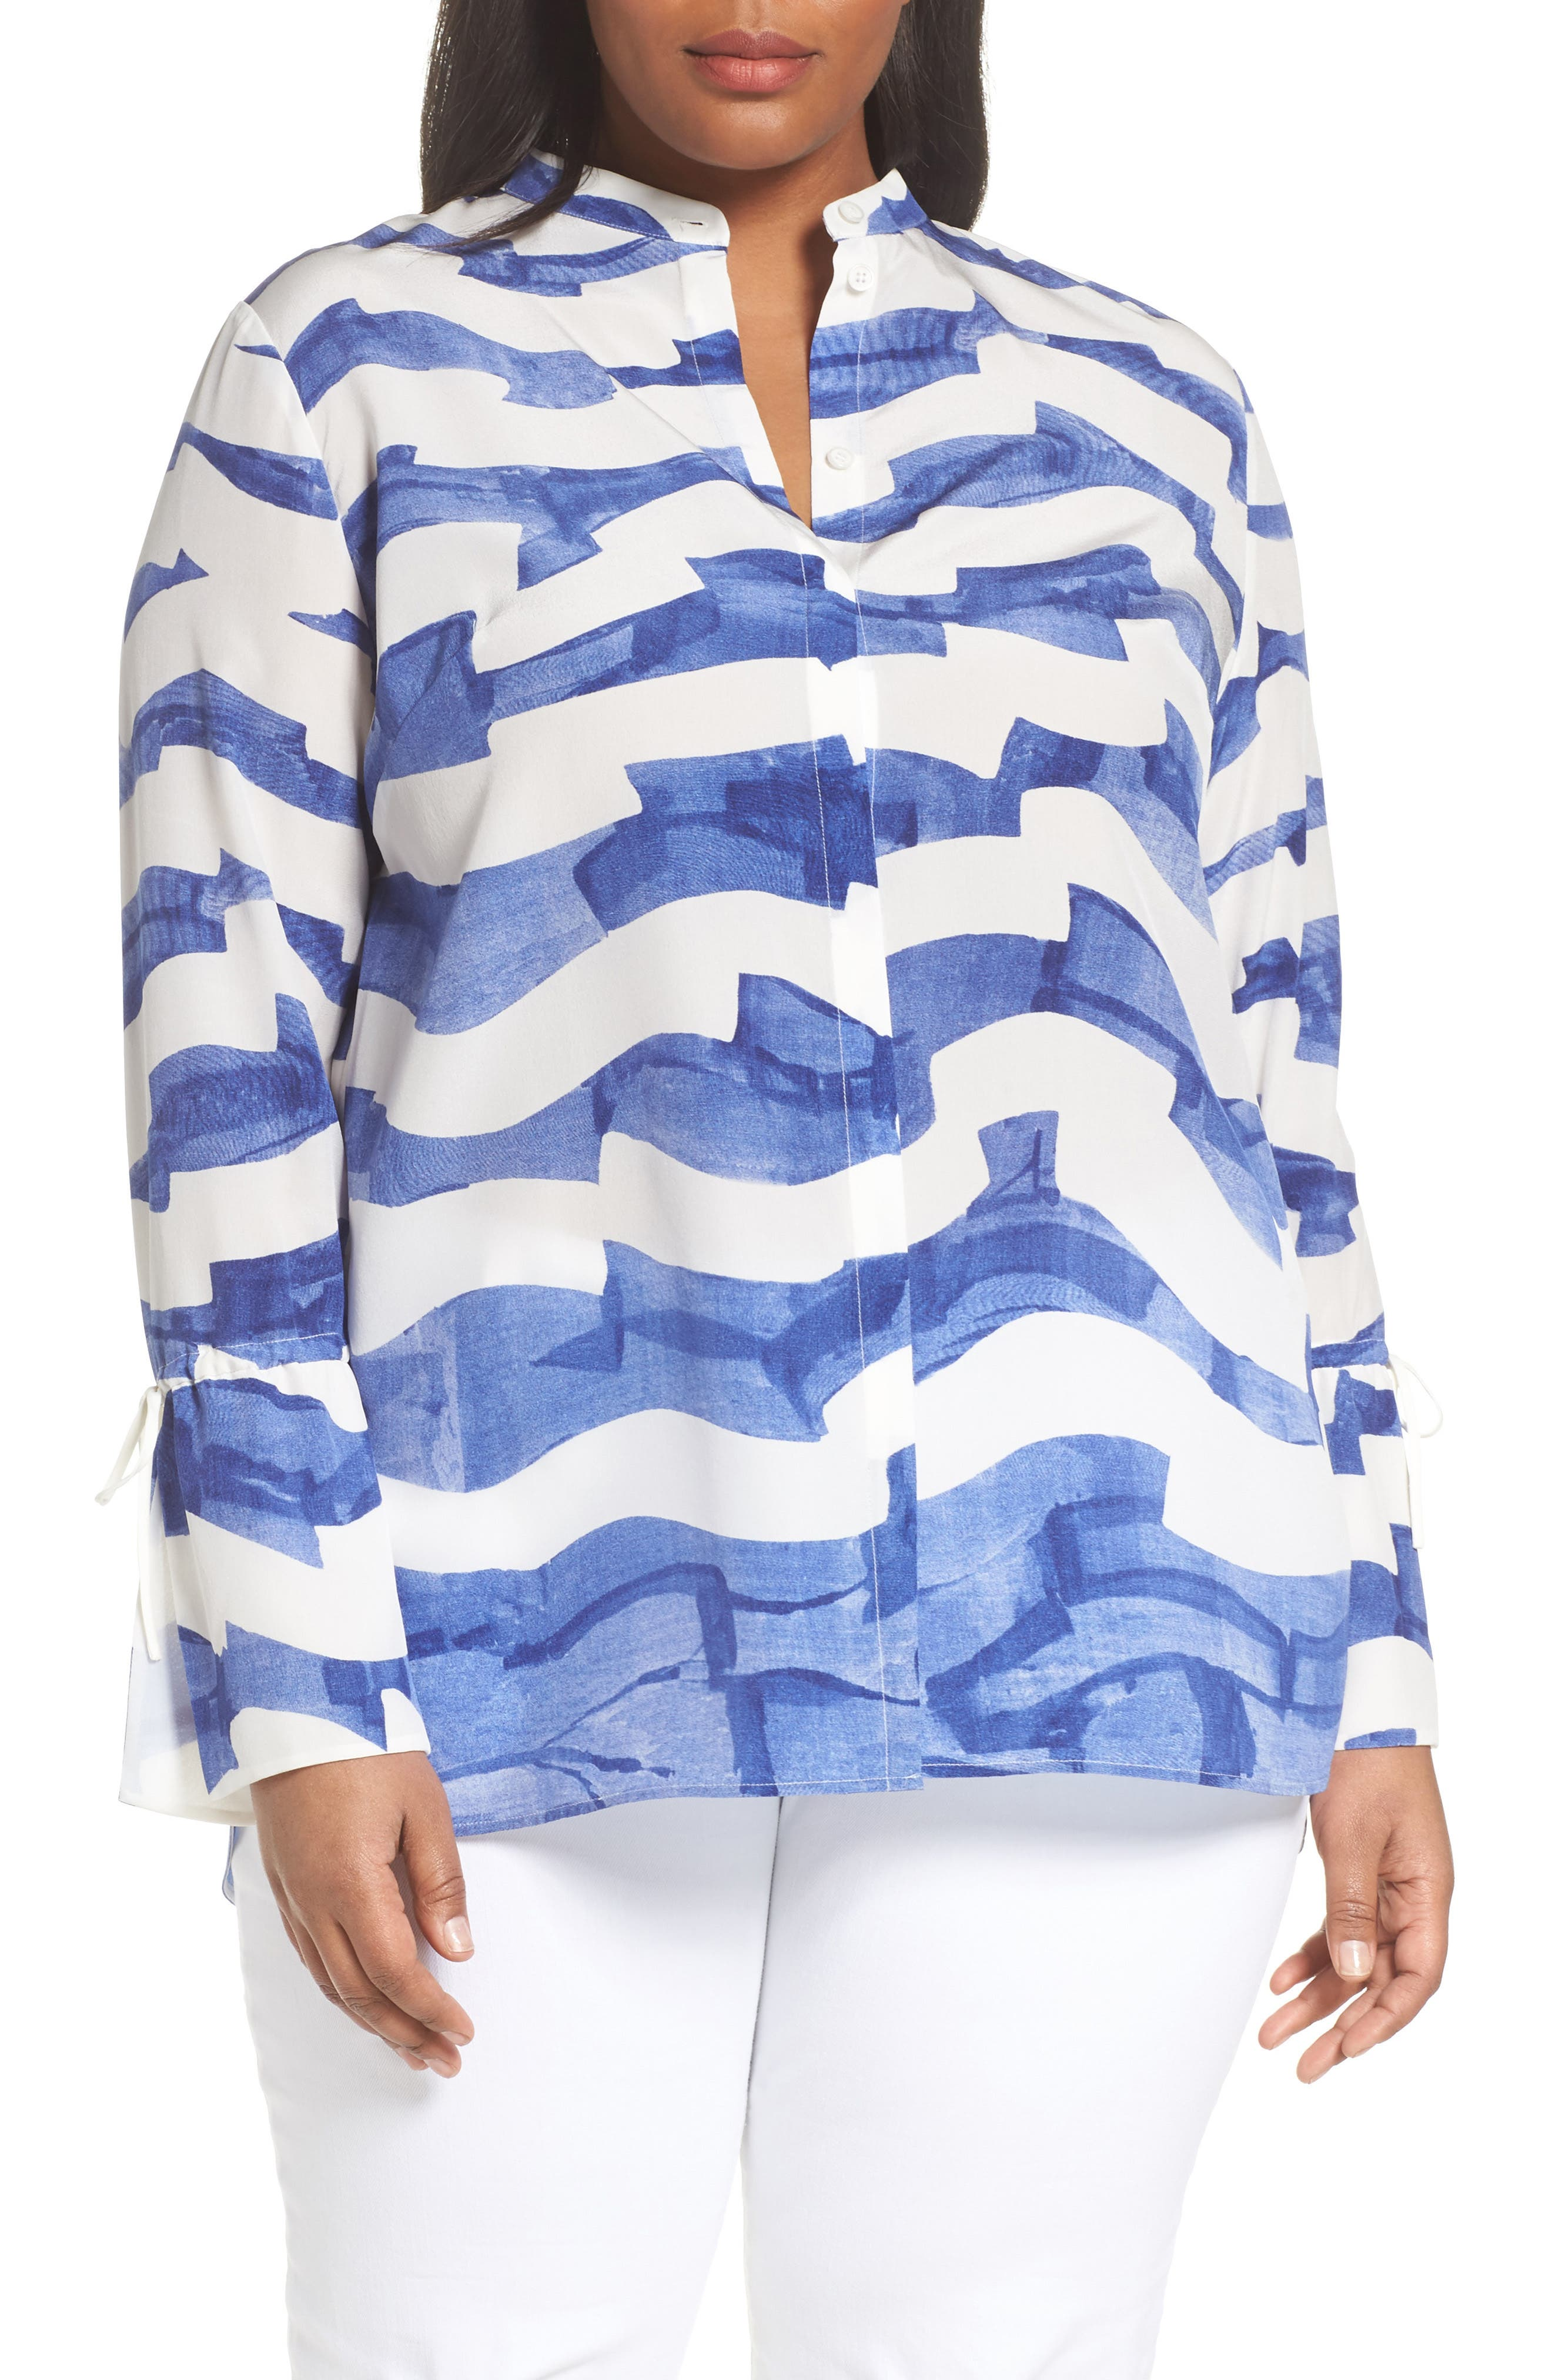 Desra Silk Blouse,                         Main,                         color, 108